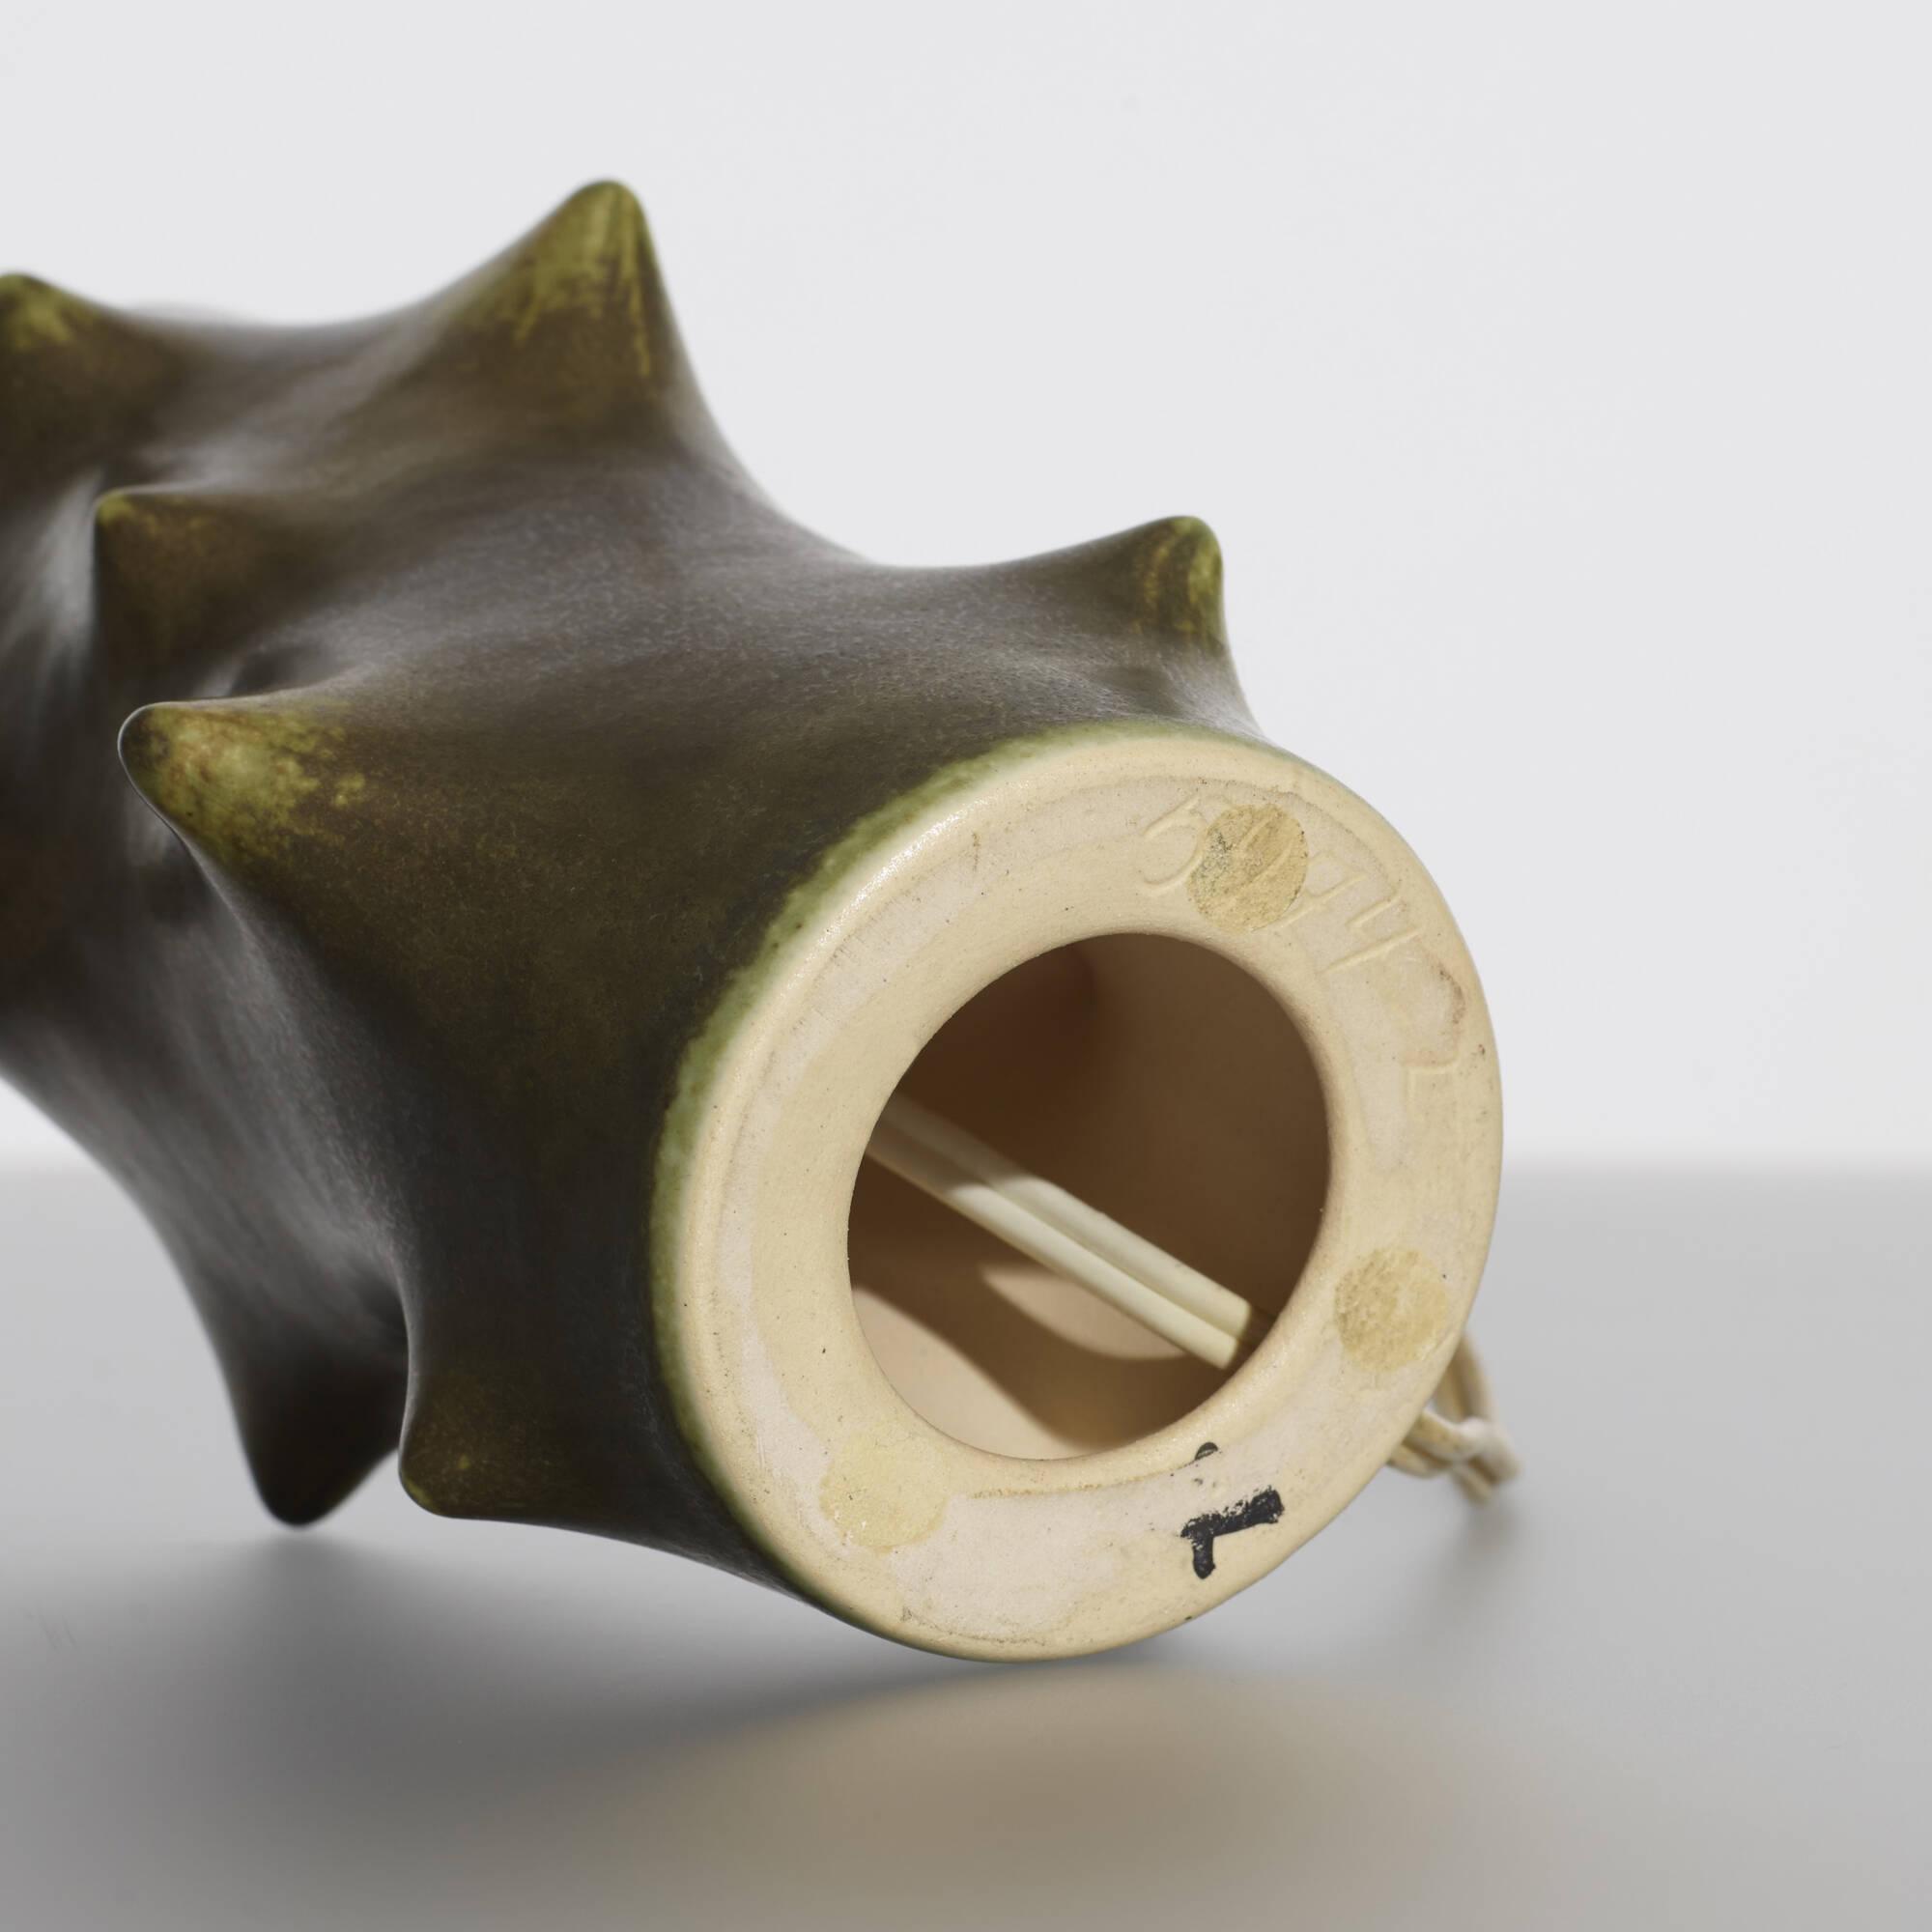 206: Knud Basse / table lamps, pair (2 of 2)